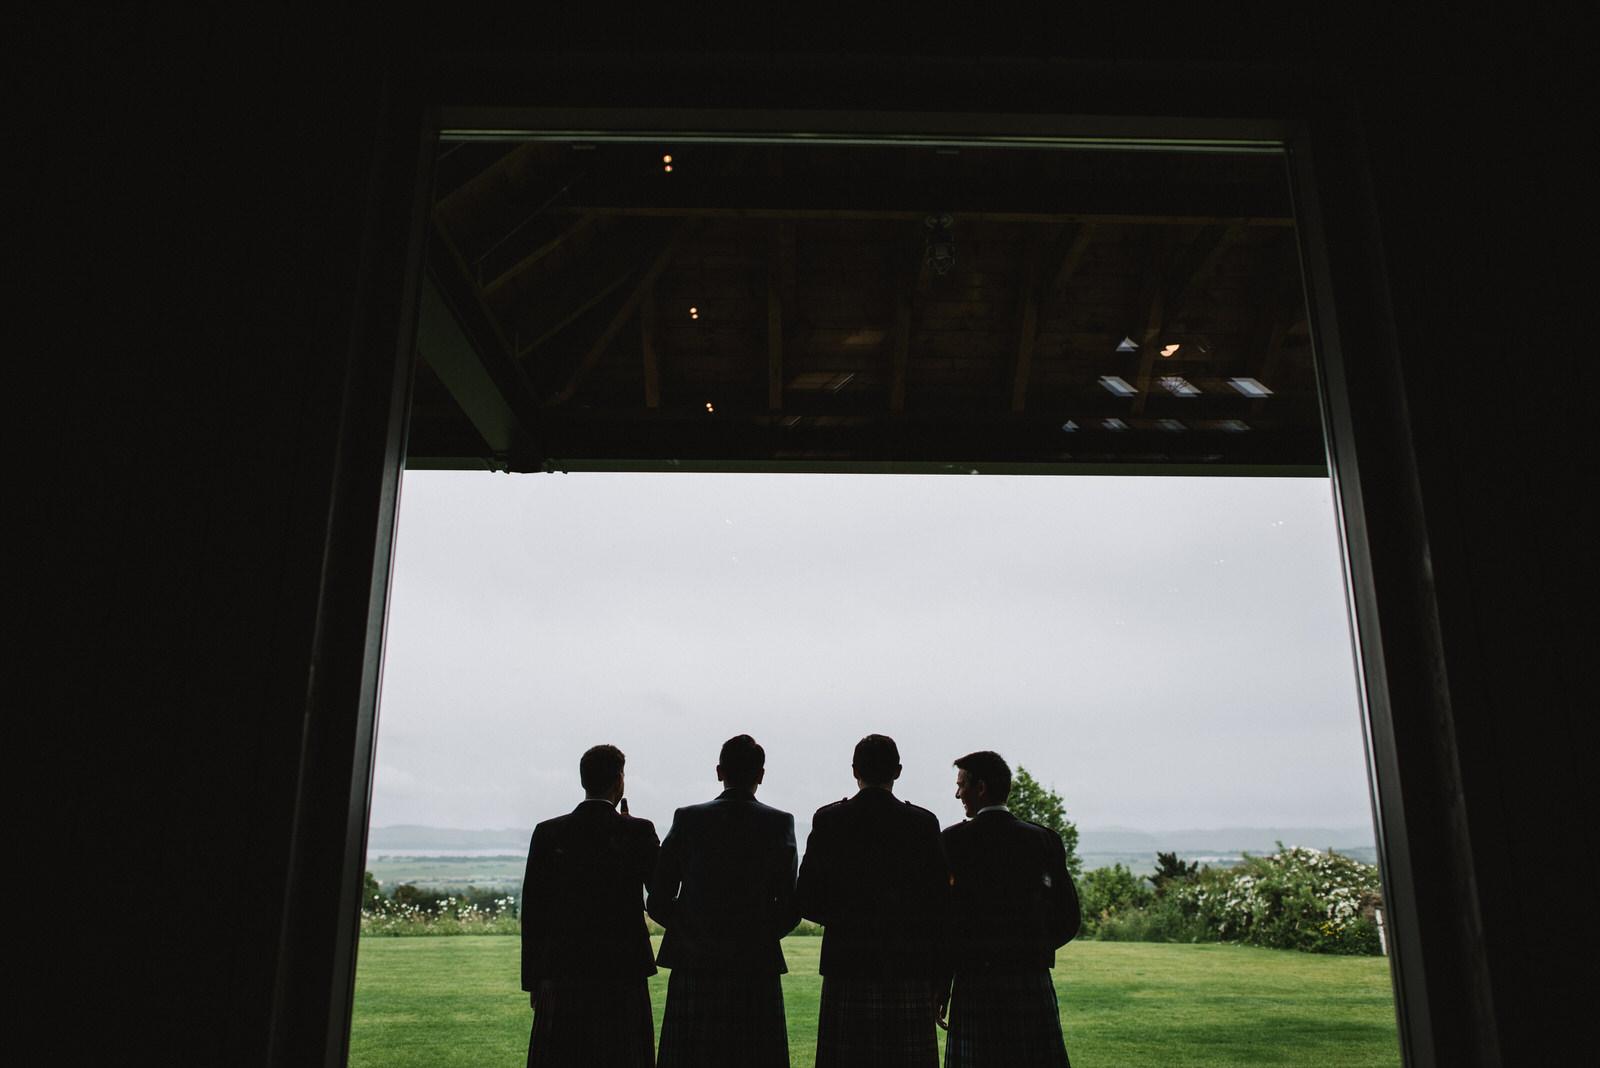 012-GUARDSWELL-FARM-WEDDING-ALTERNATIVE-SCOTTISH-WEDDING-PHOTOGRAPHER-SCOTTISH-WEDDING-DESTINATION-WEDDING-PHOTOGRAPHER.JPG